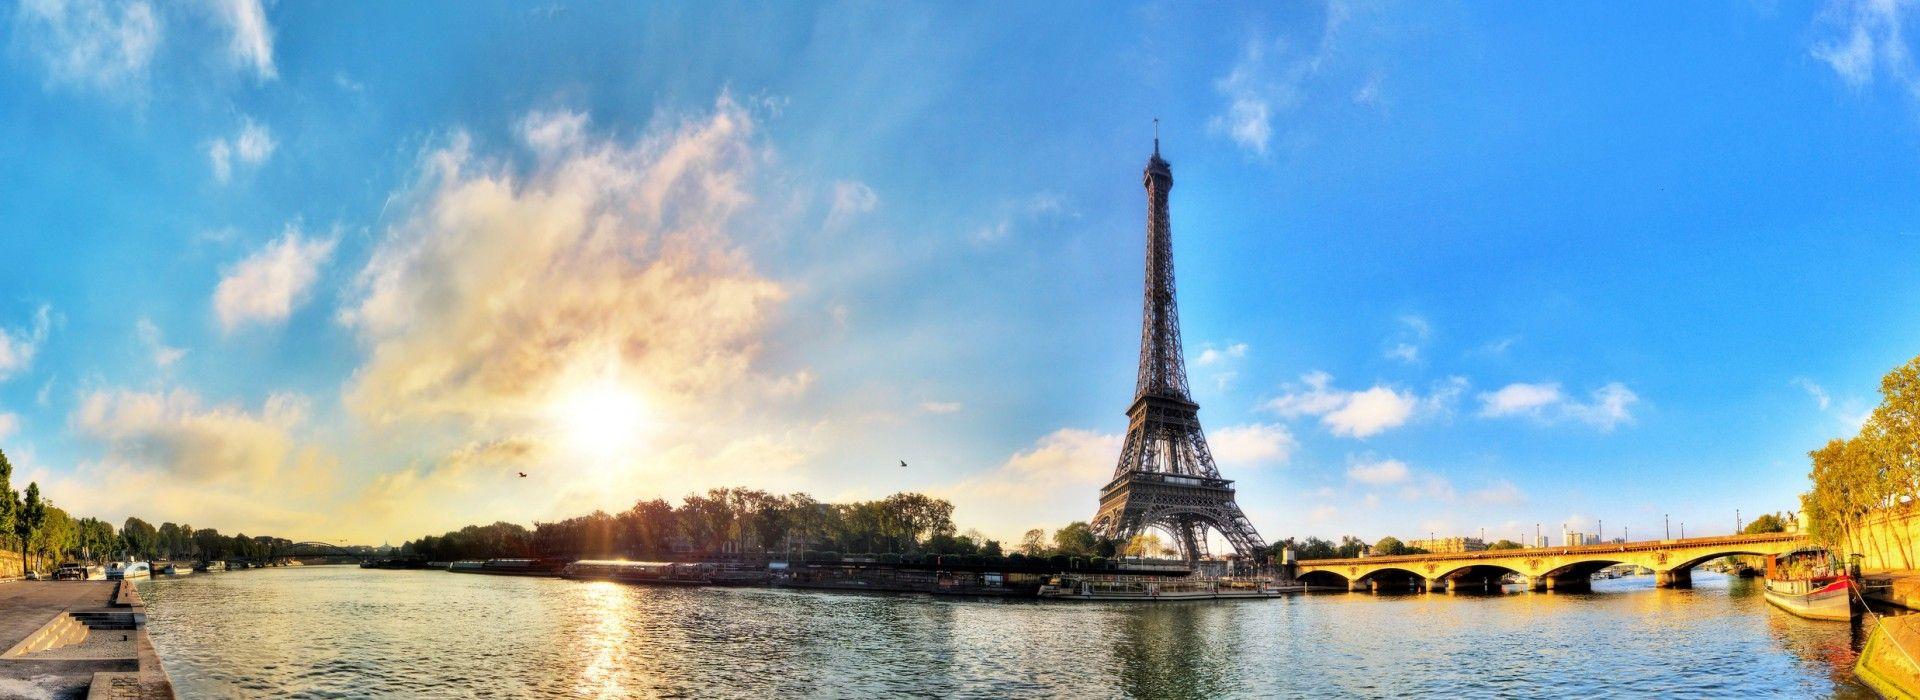 Cultural, religious and historic sites Tours in Paris